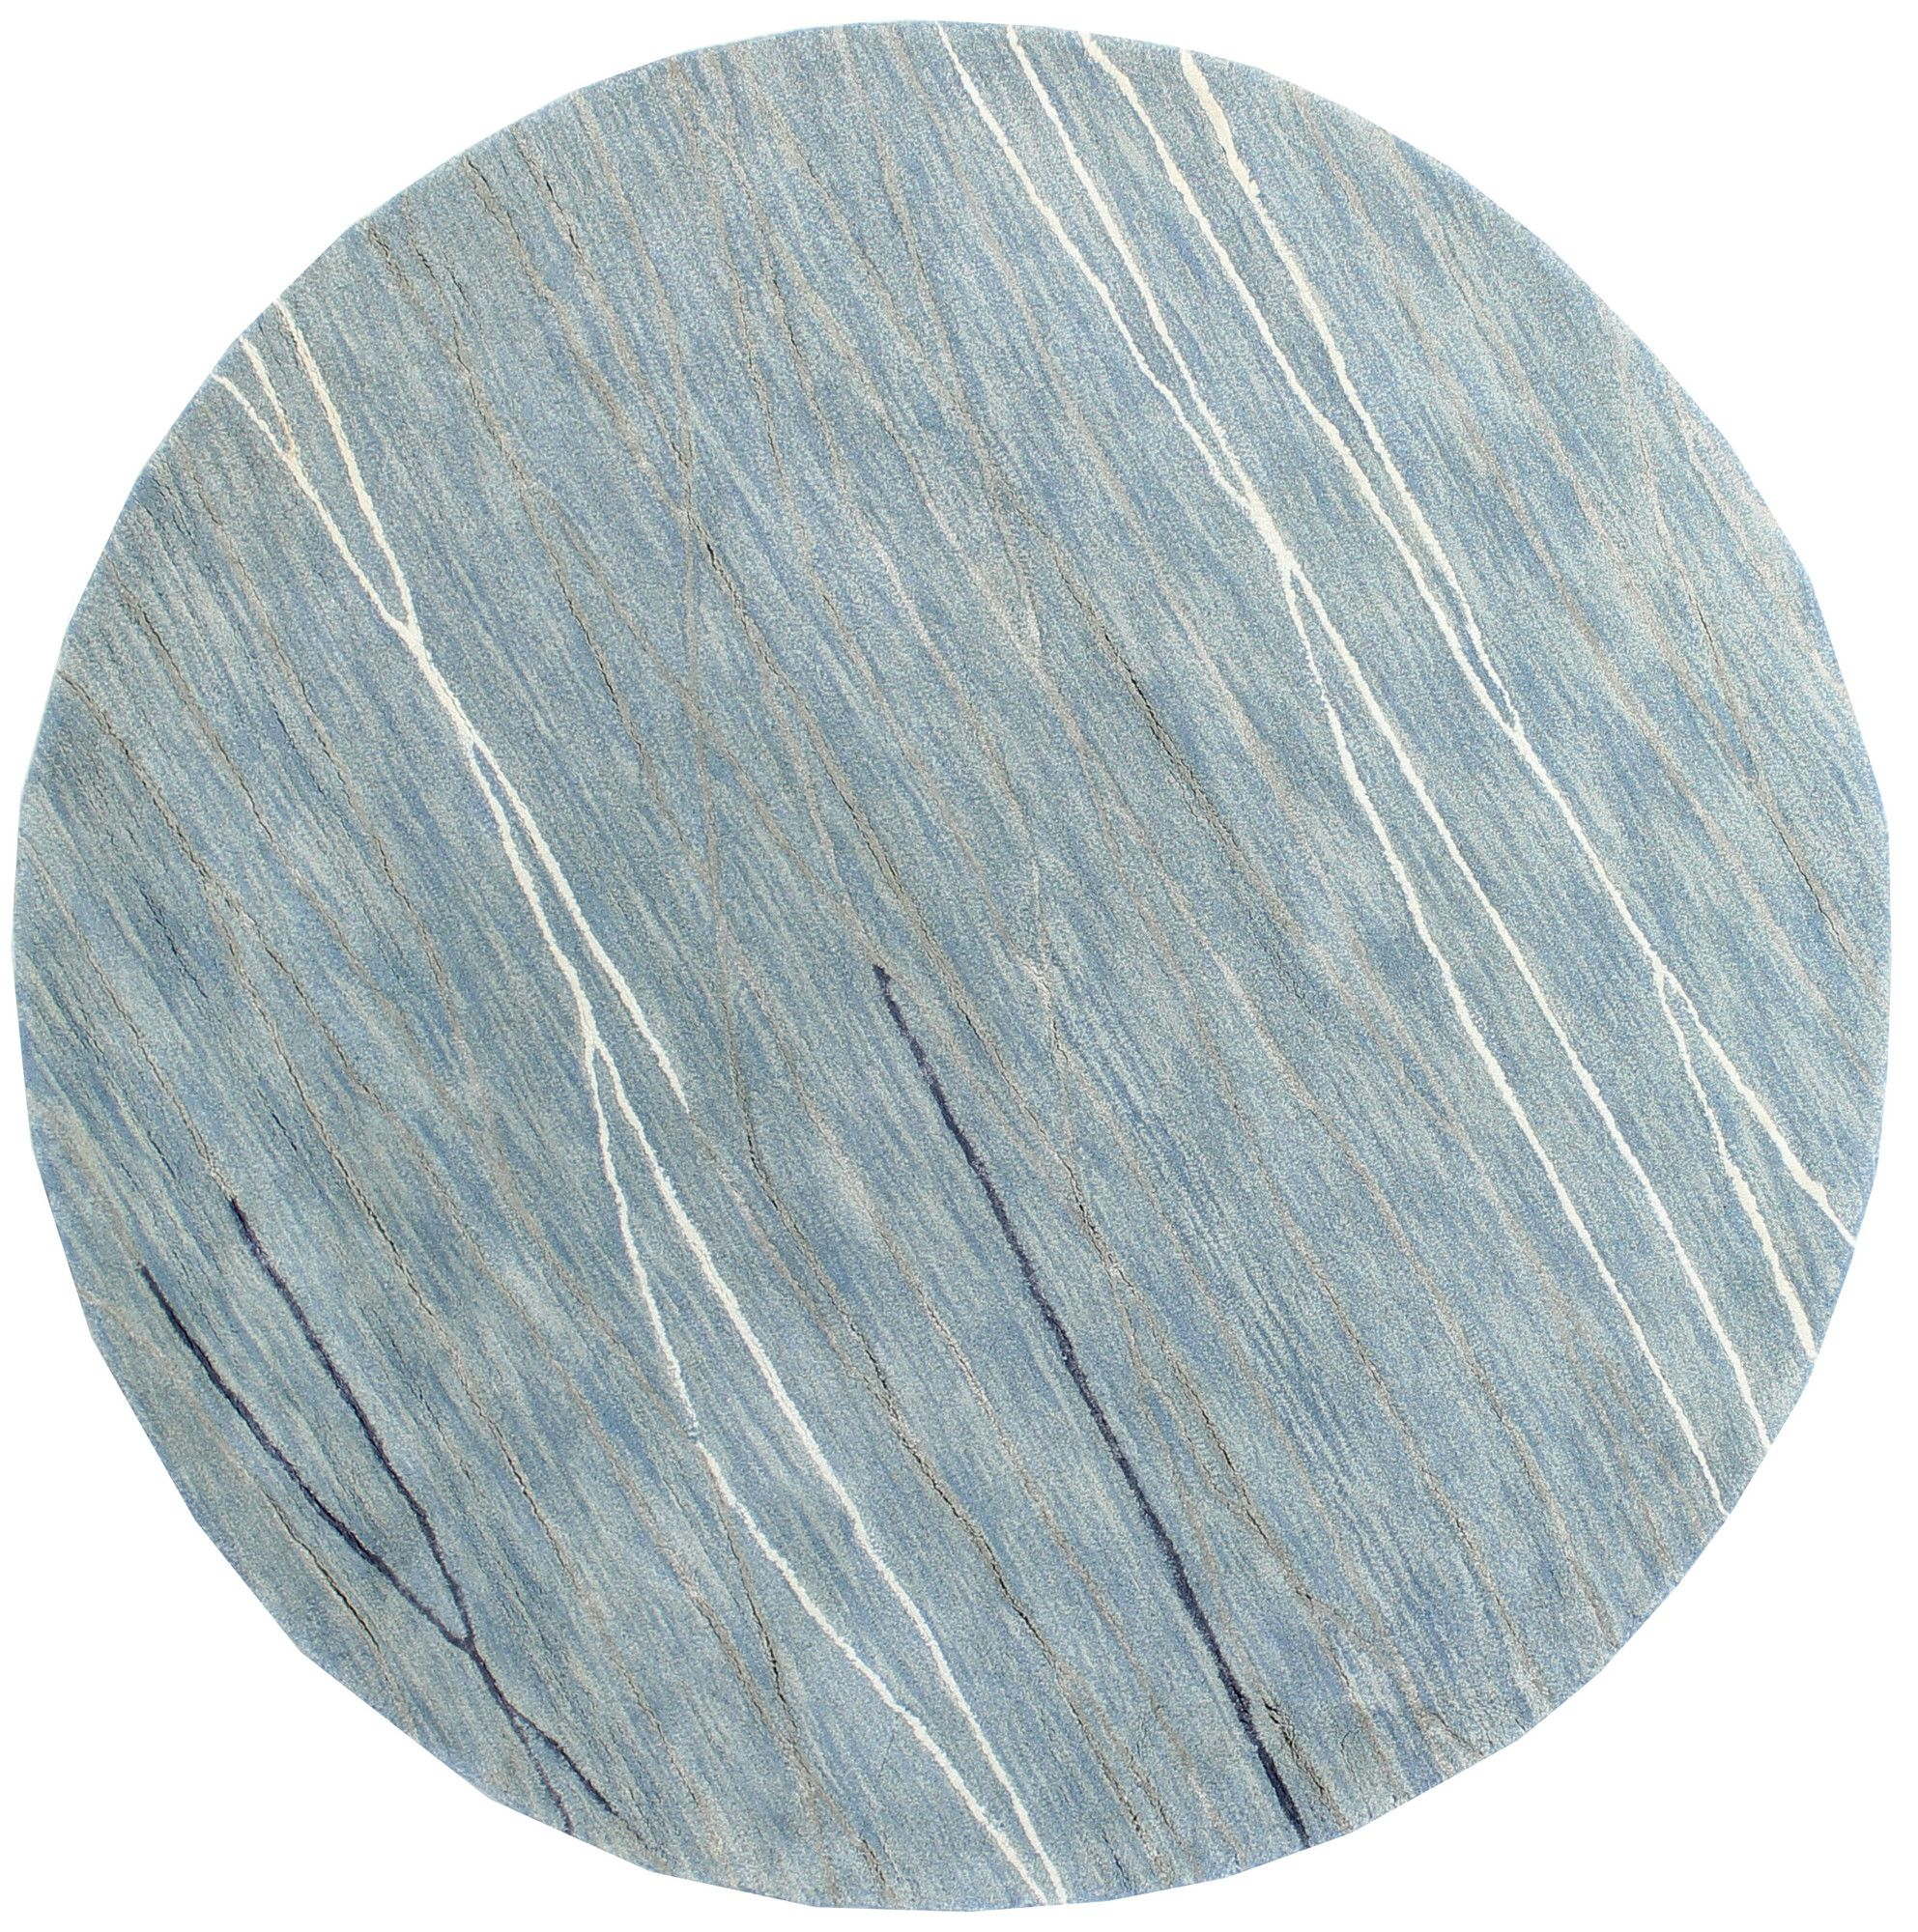 Luczak Hand-Tufted Light Blue Area Rug